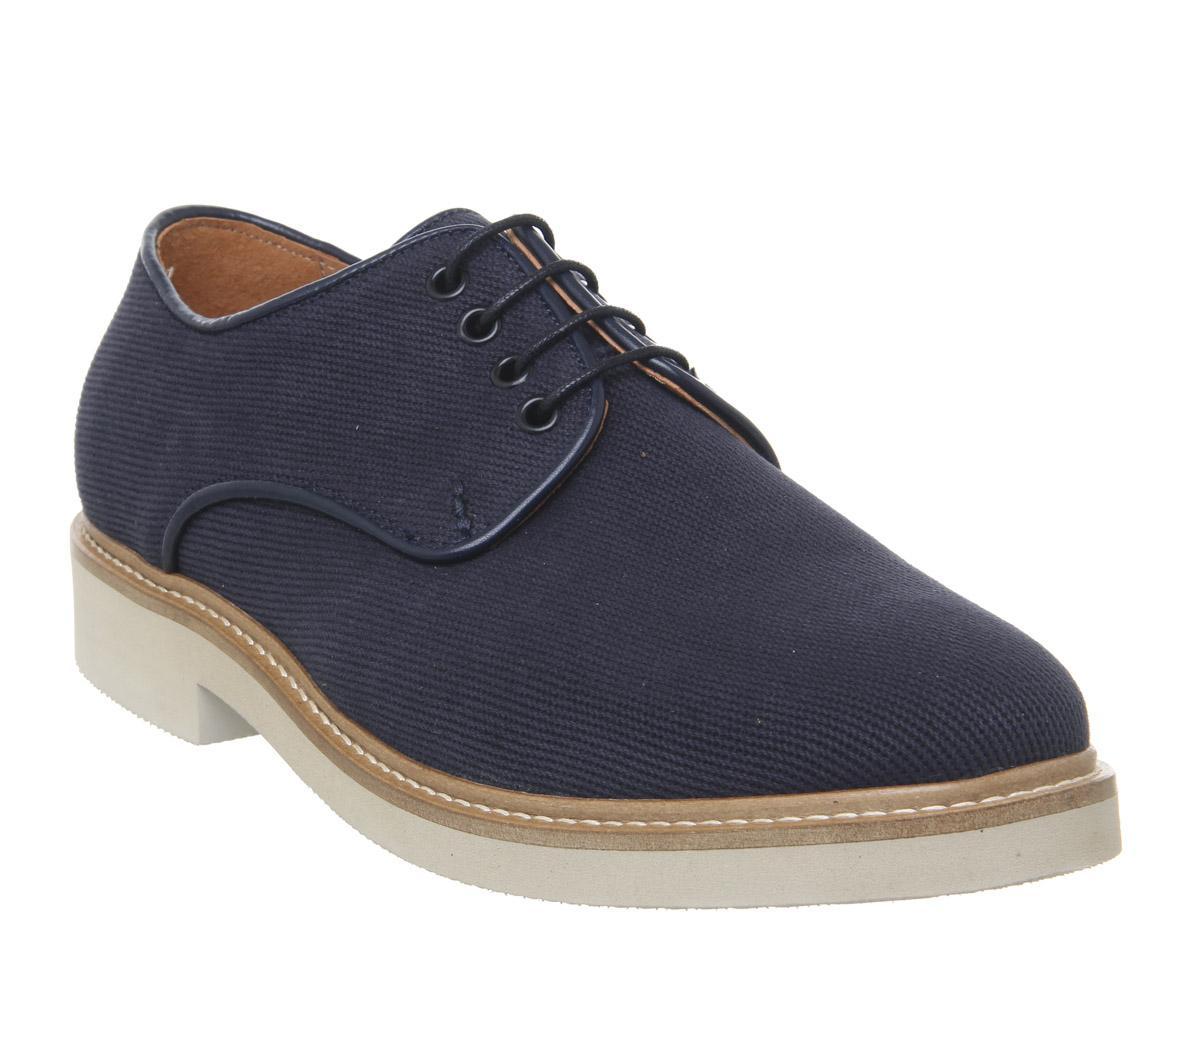 Greenwich Derby Shoes